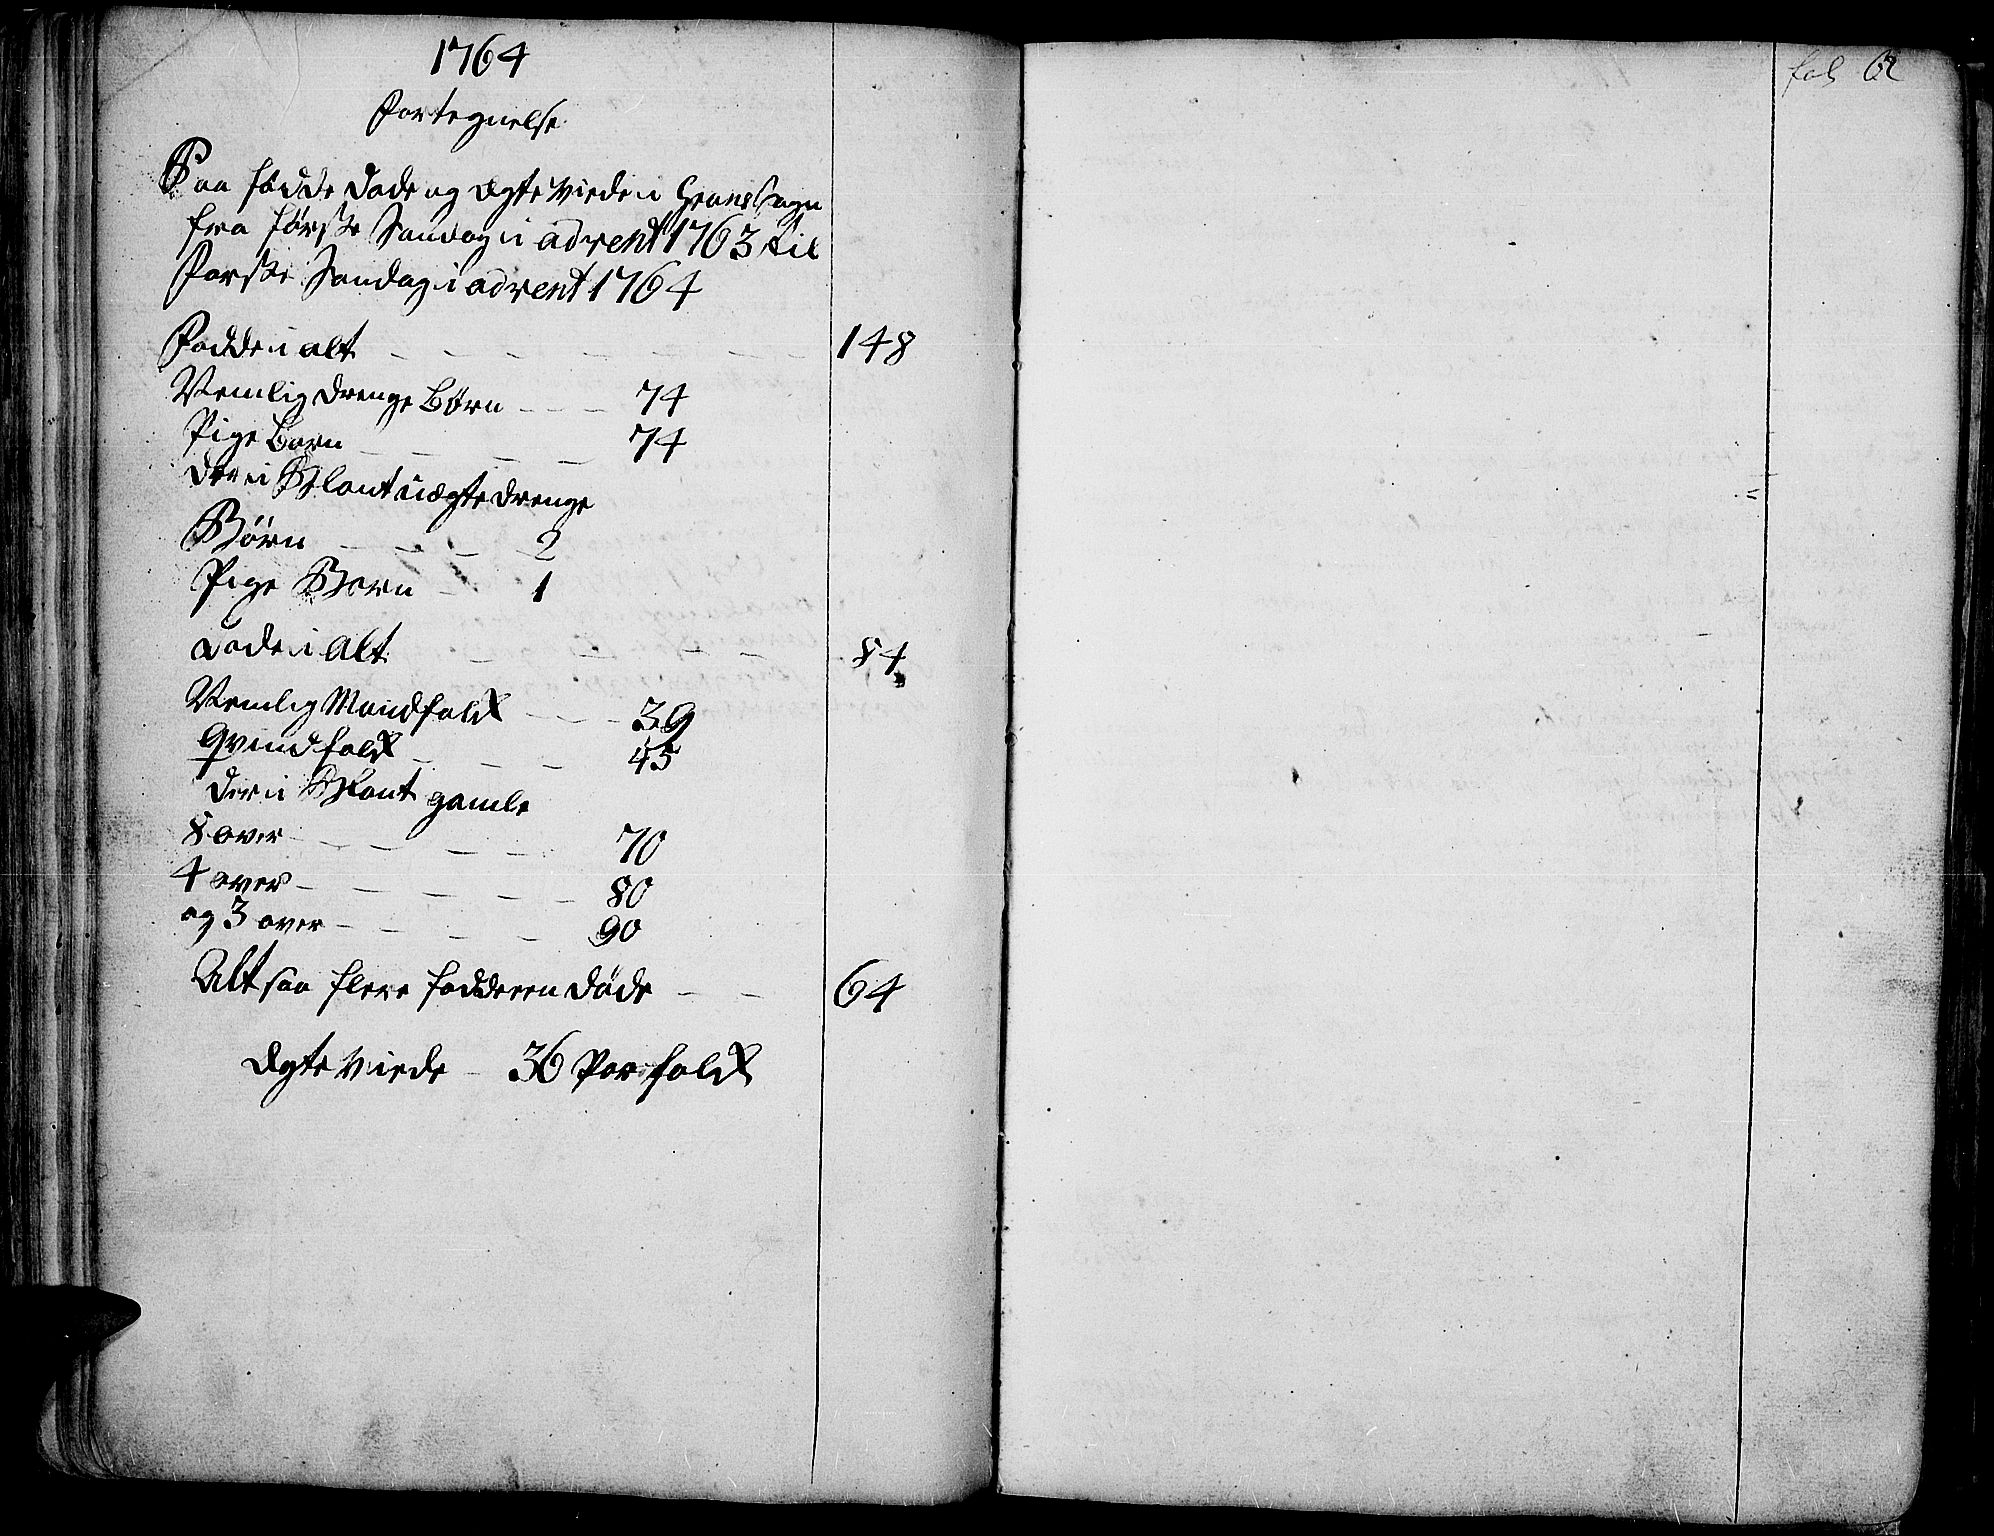 SAH, Gran prestekontor, Ministerialbok nr. 4, 1759-1775, s. 62